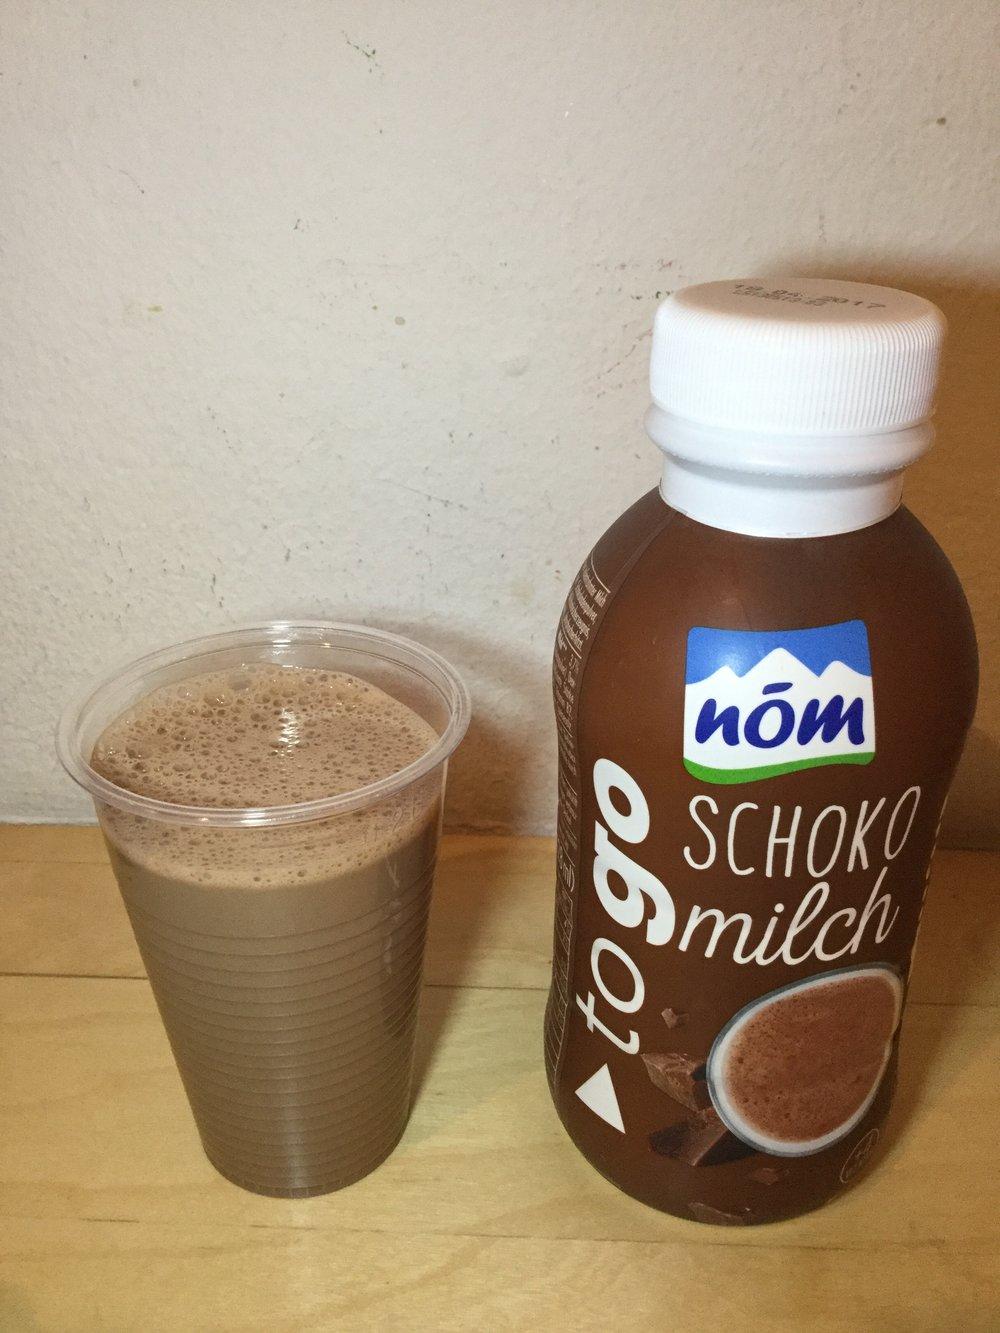 Nom To Go Schoko Milch Cup